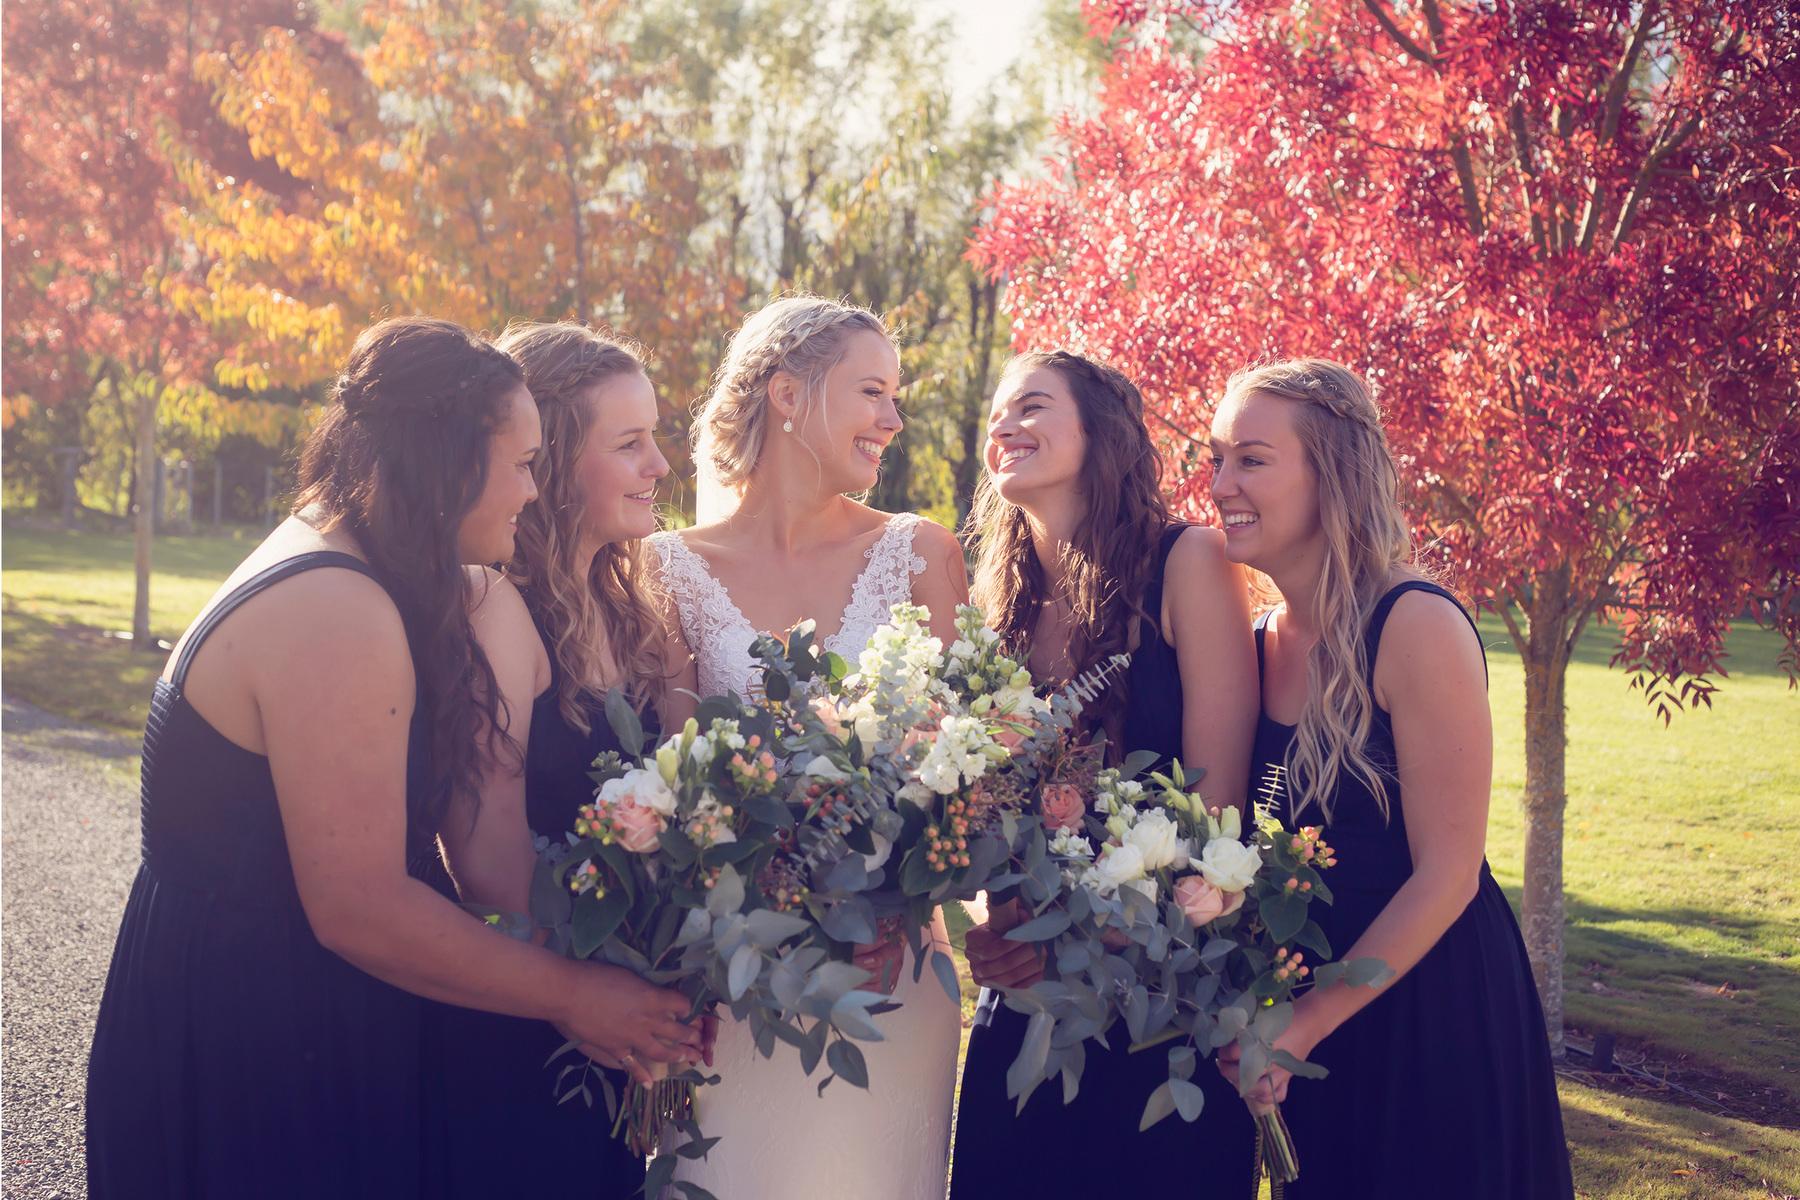 wedding-photogrpaher-kapiti-michelle-10A.JPG